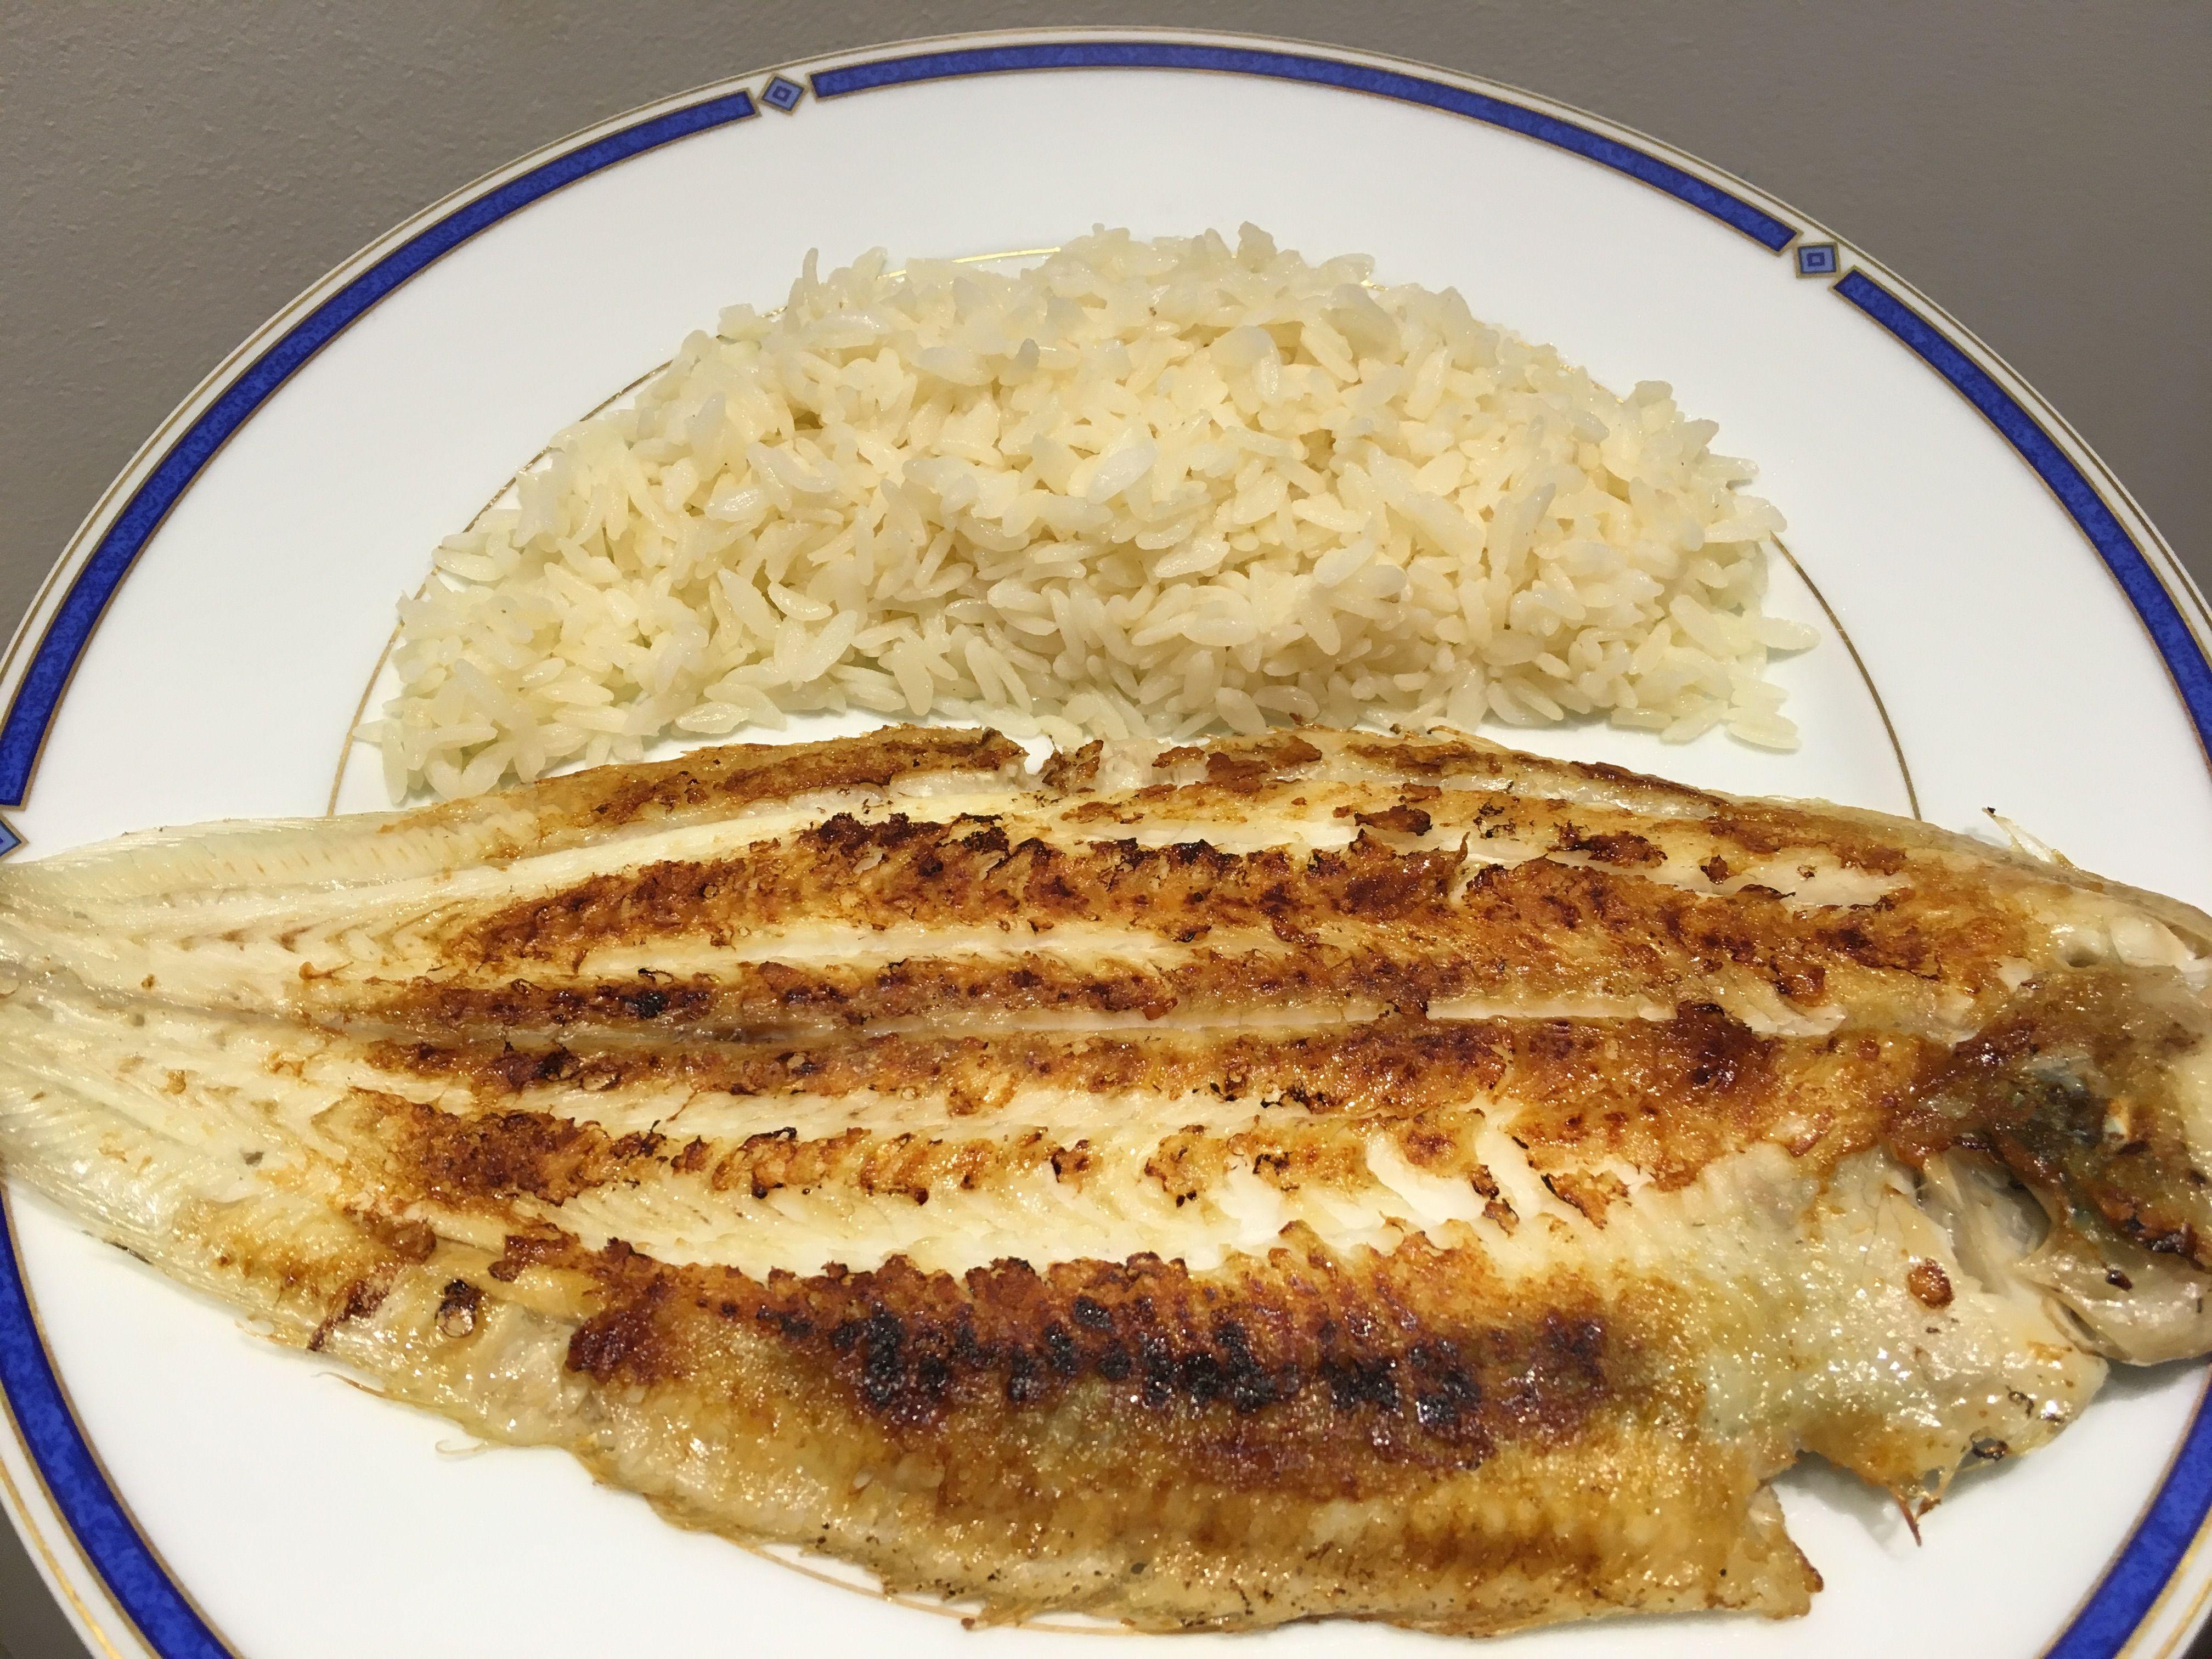 Sole grillée accompagnée de riz